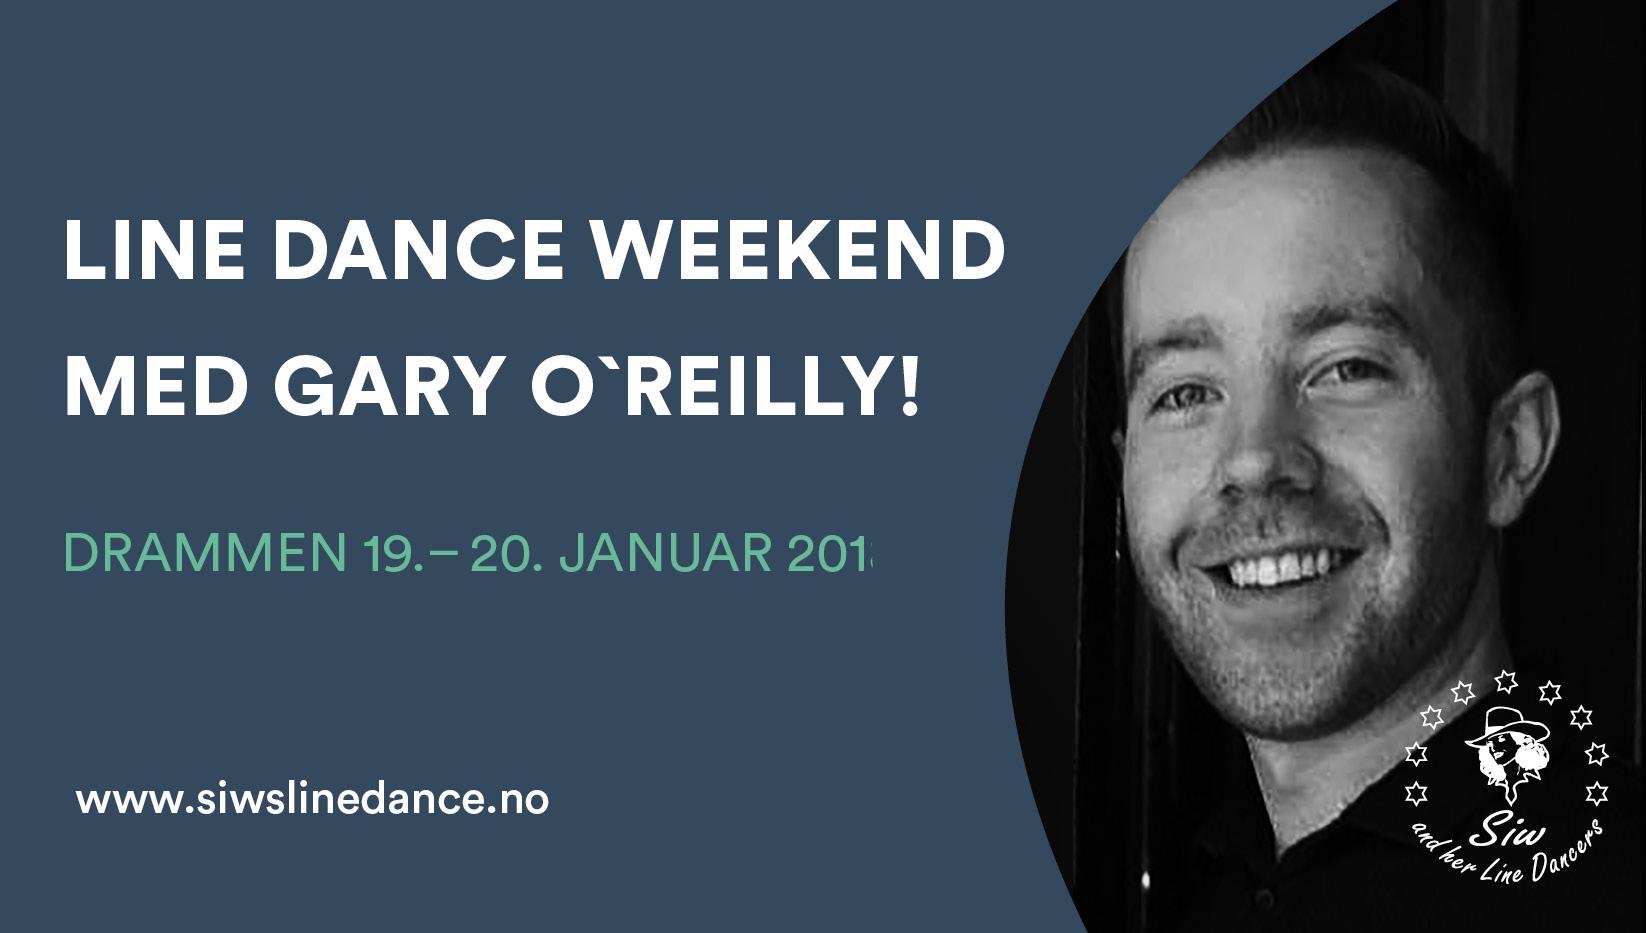 Linedanceweekend_hjemmeside